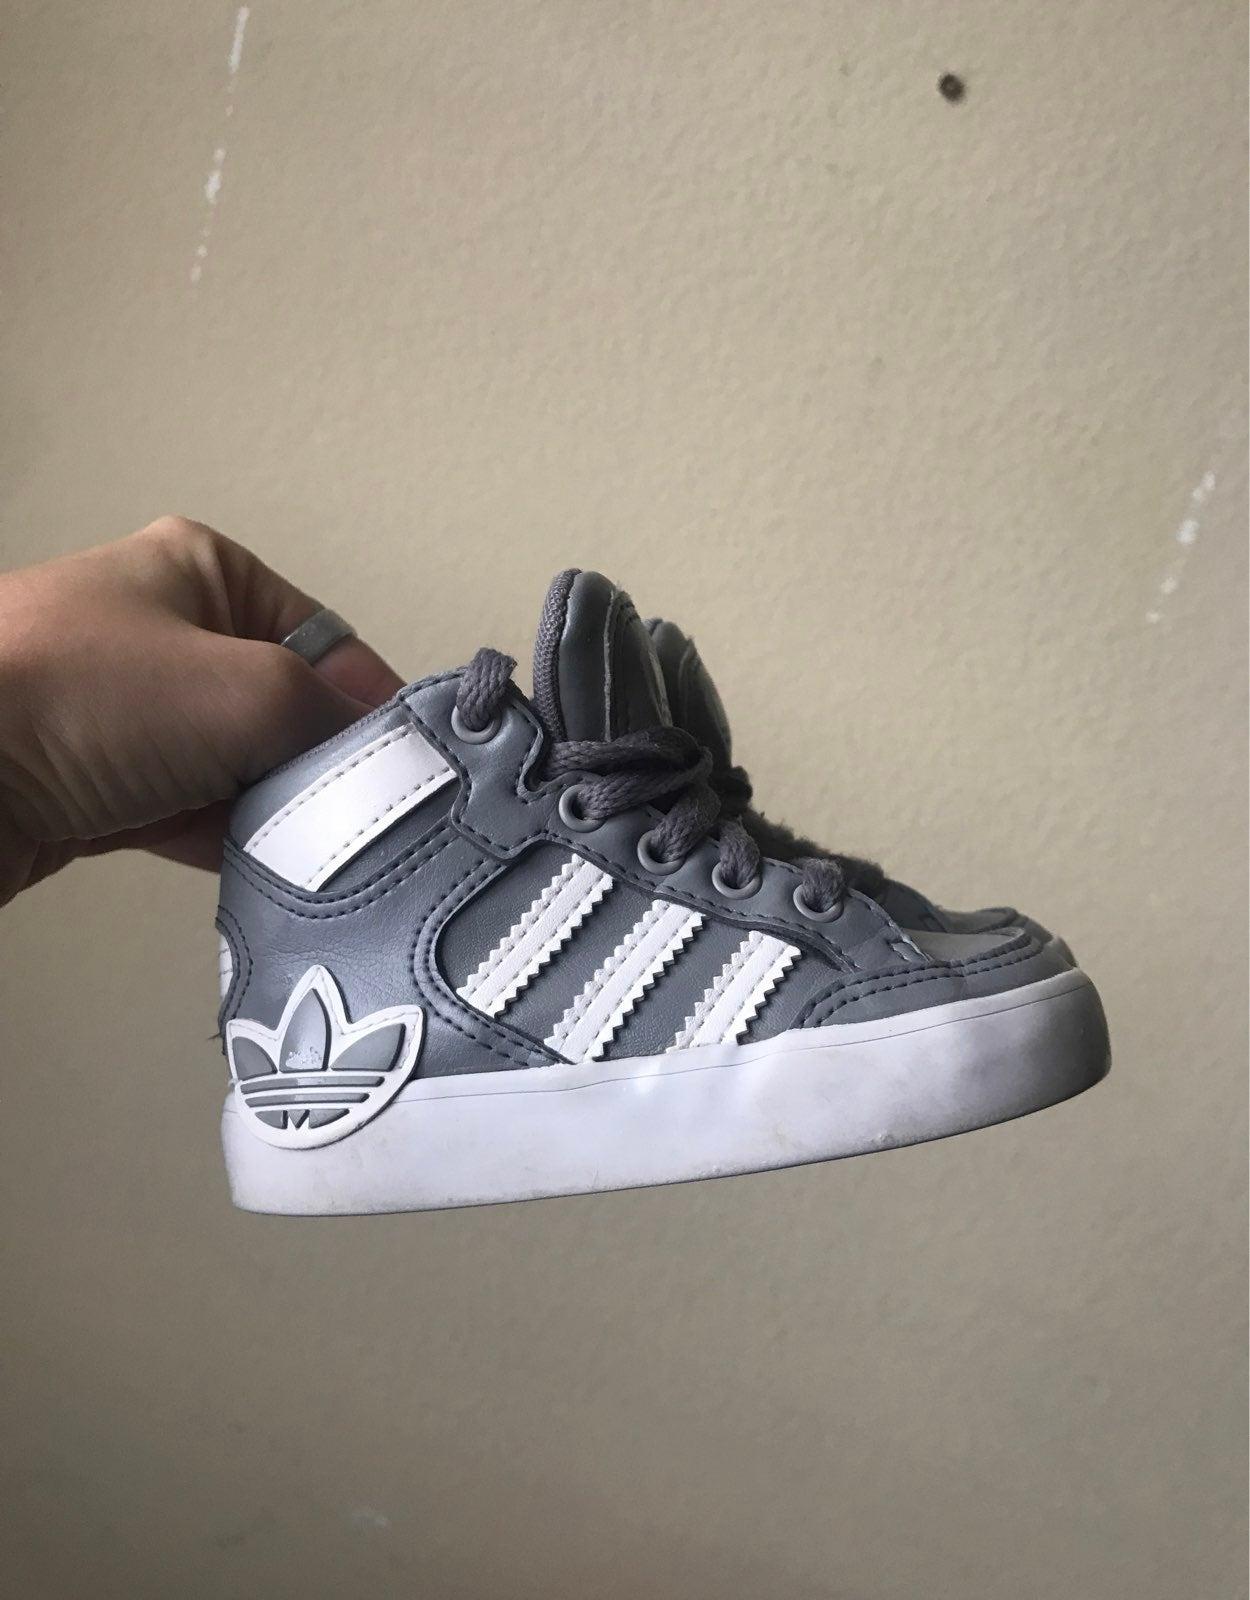 kids toddler adidas high tops size 5